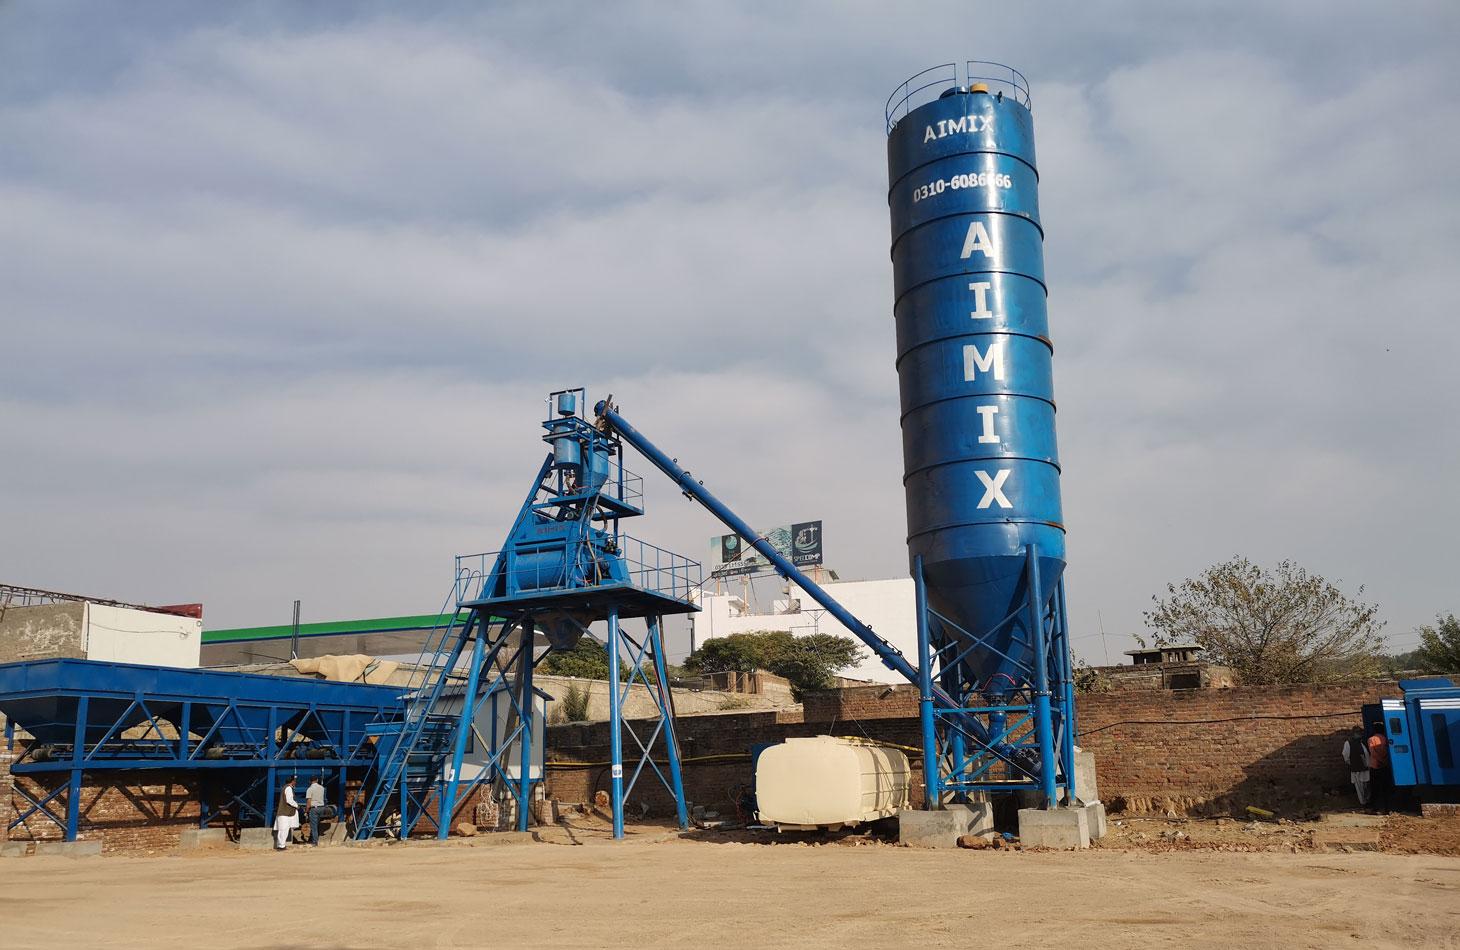 install AJ-50 stationary concrete plant in Pakistan